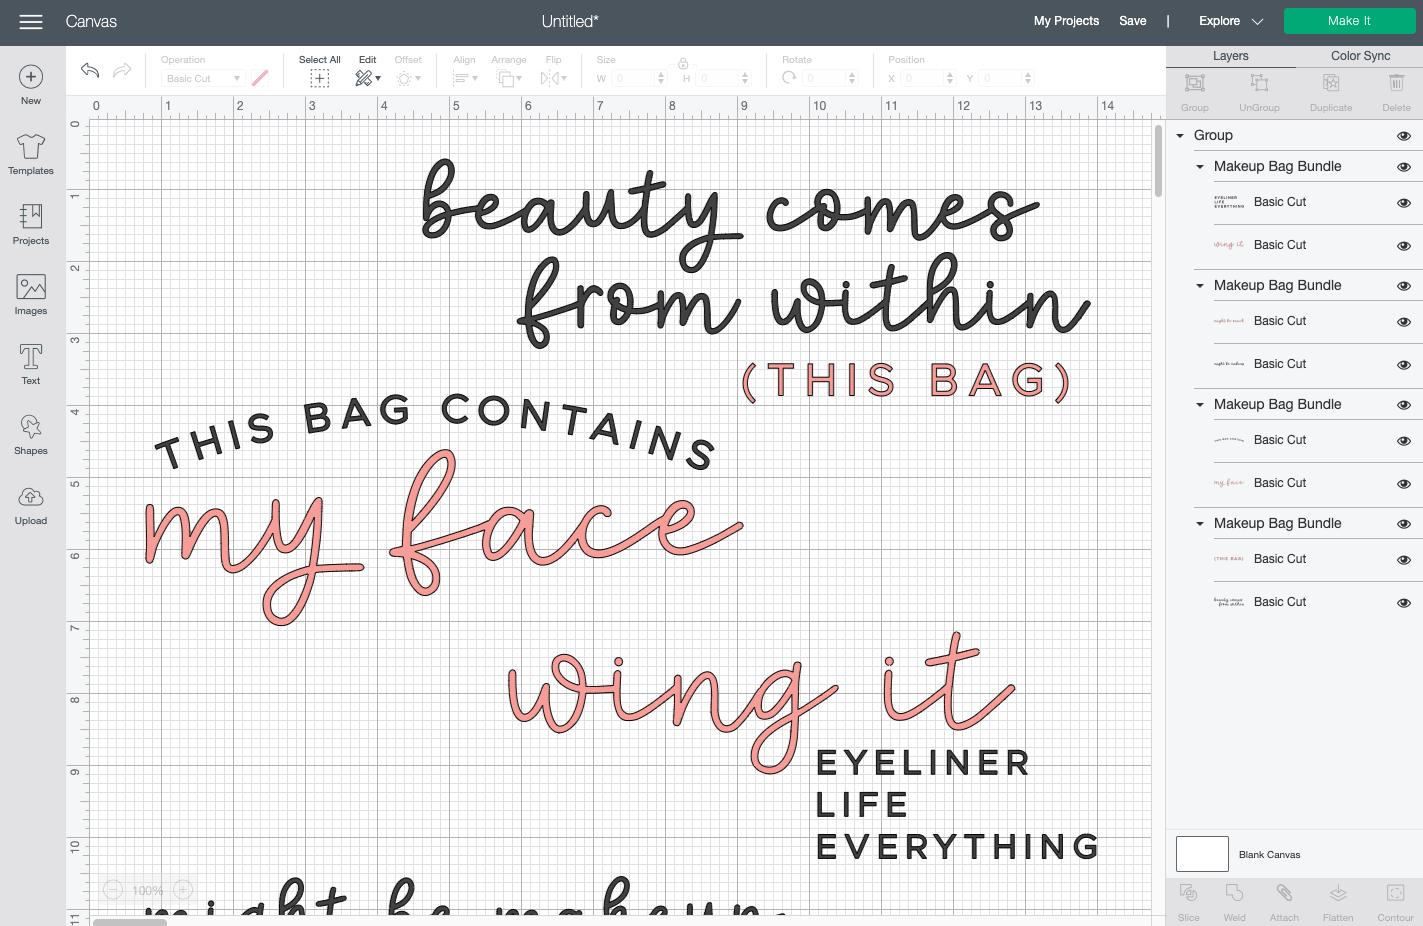 Cricut Design Space: four makeup bag SVGs uploaded to Canvas